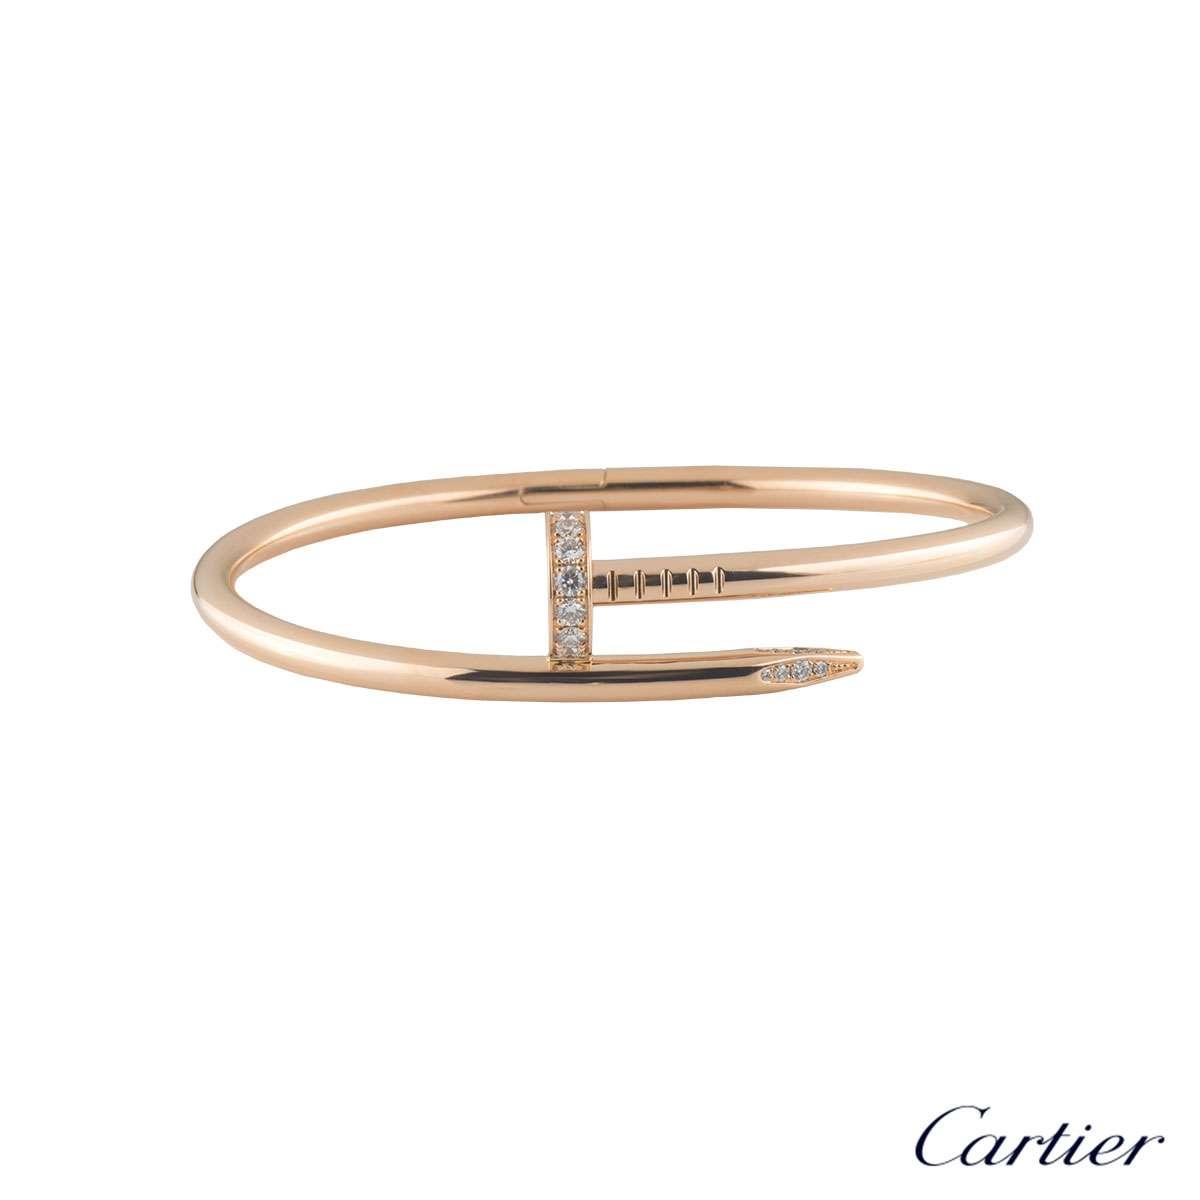 Cartier Rose Gold Diamond Juste Un Clou Bracelet Size 17 B6048517